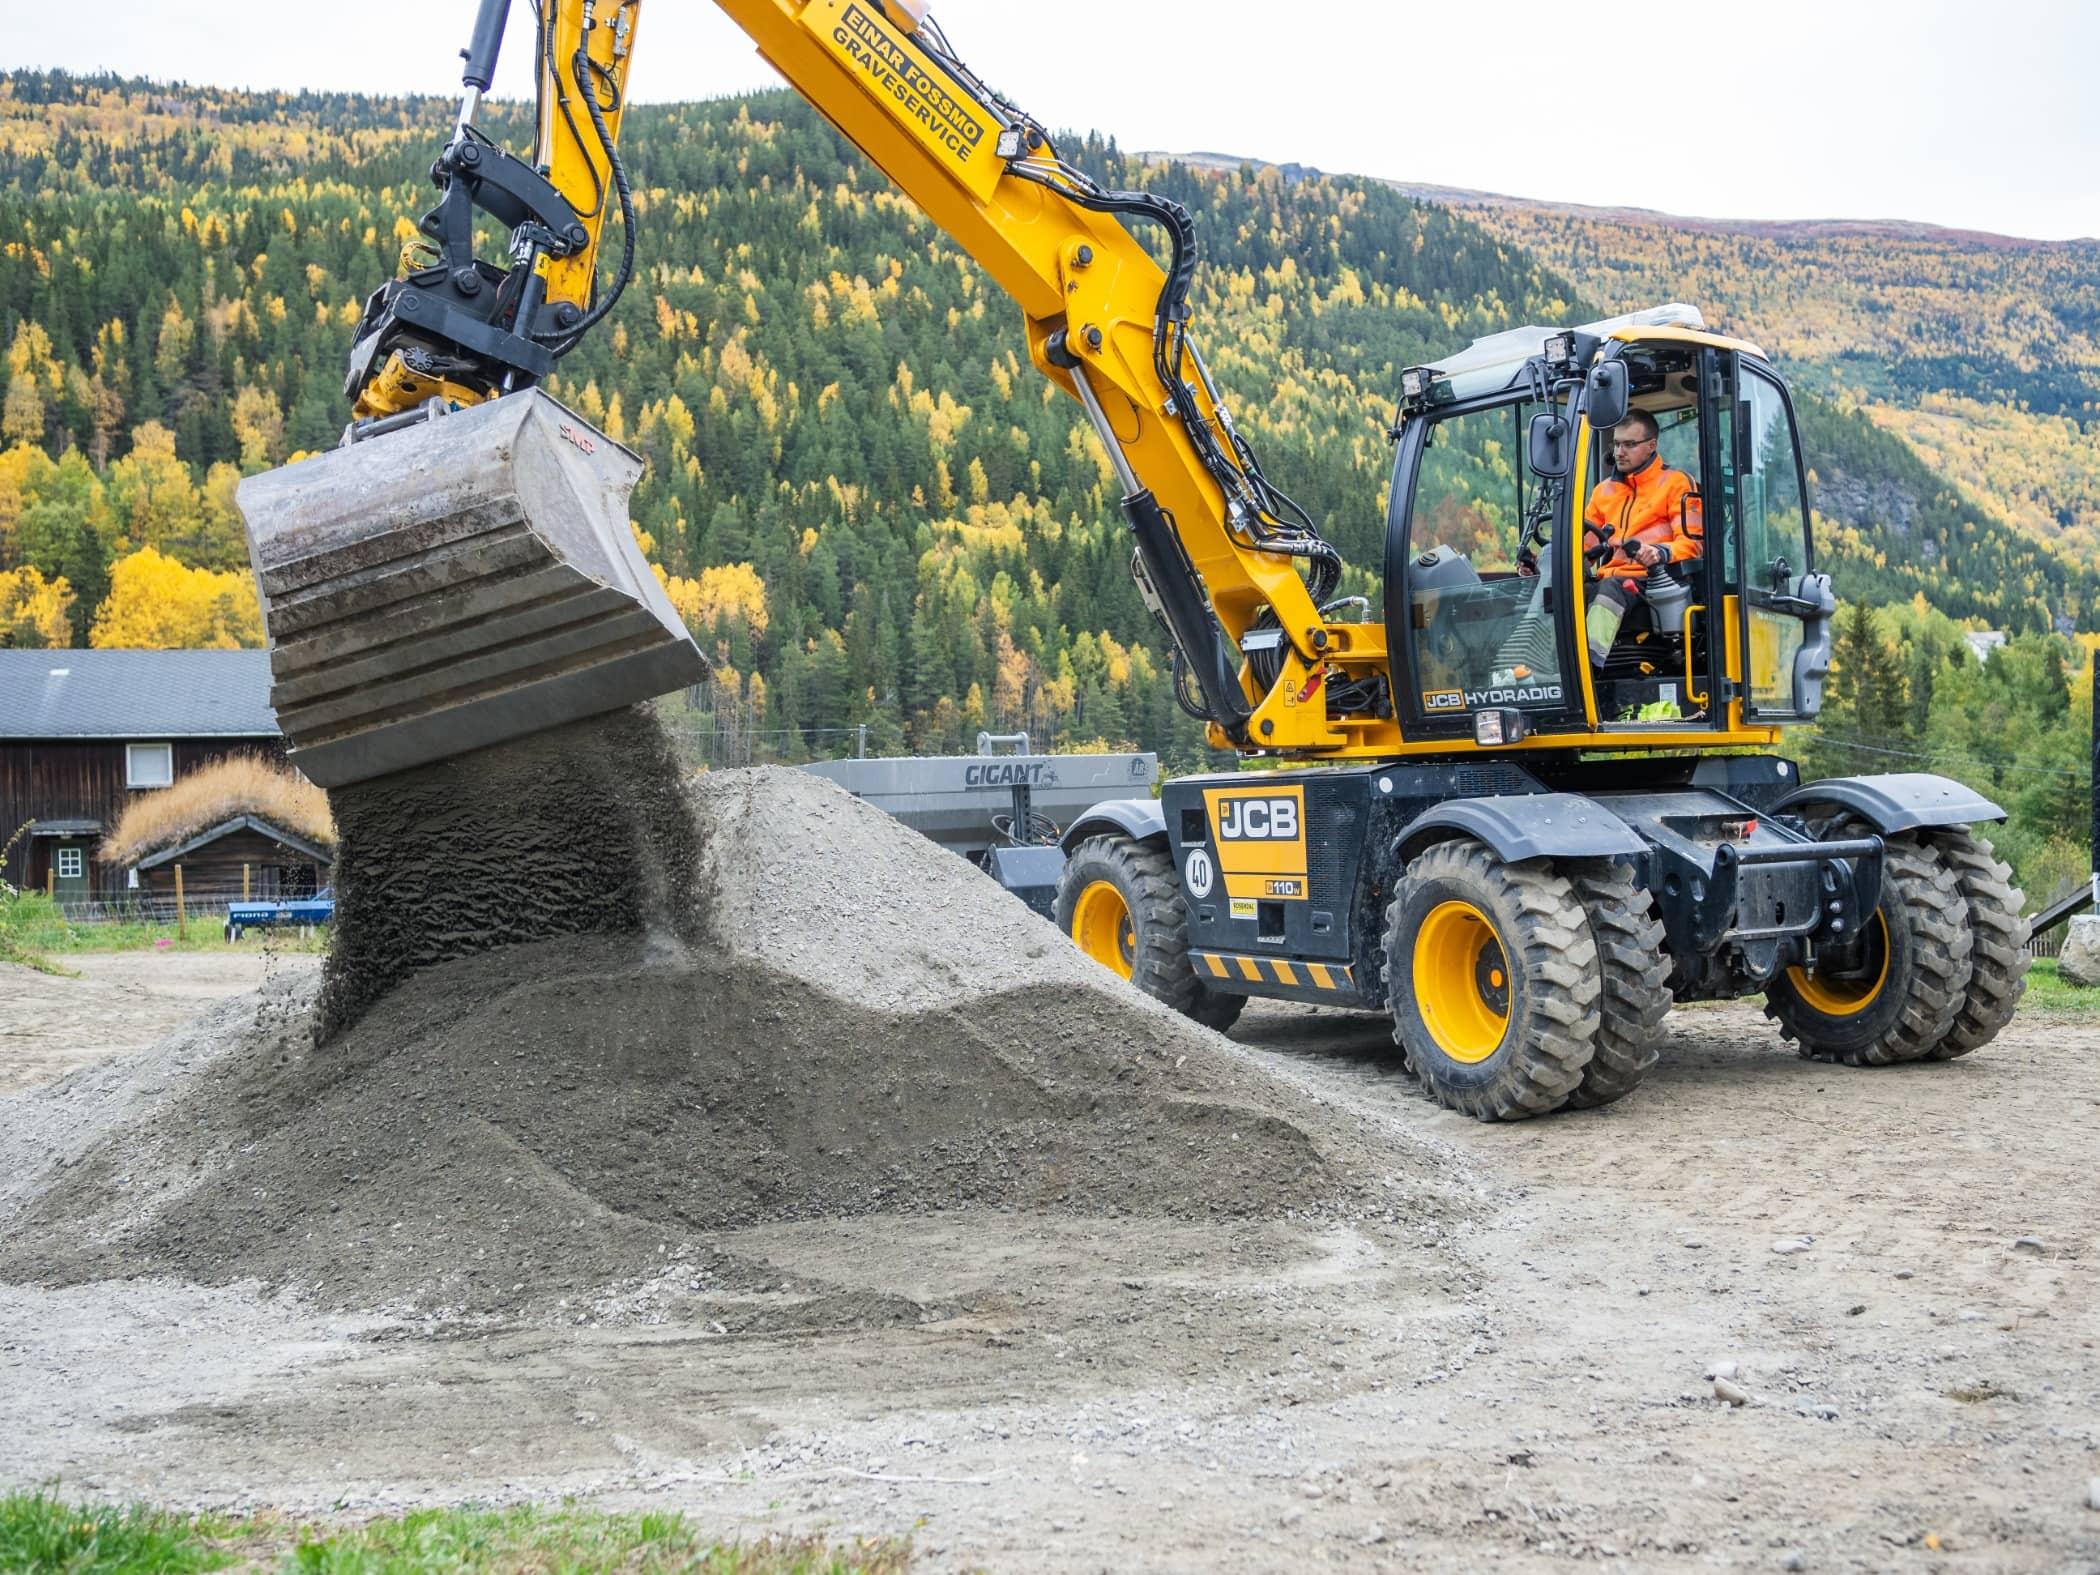 Construction equipment, Transport, Vehicle